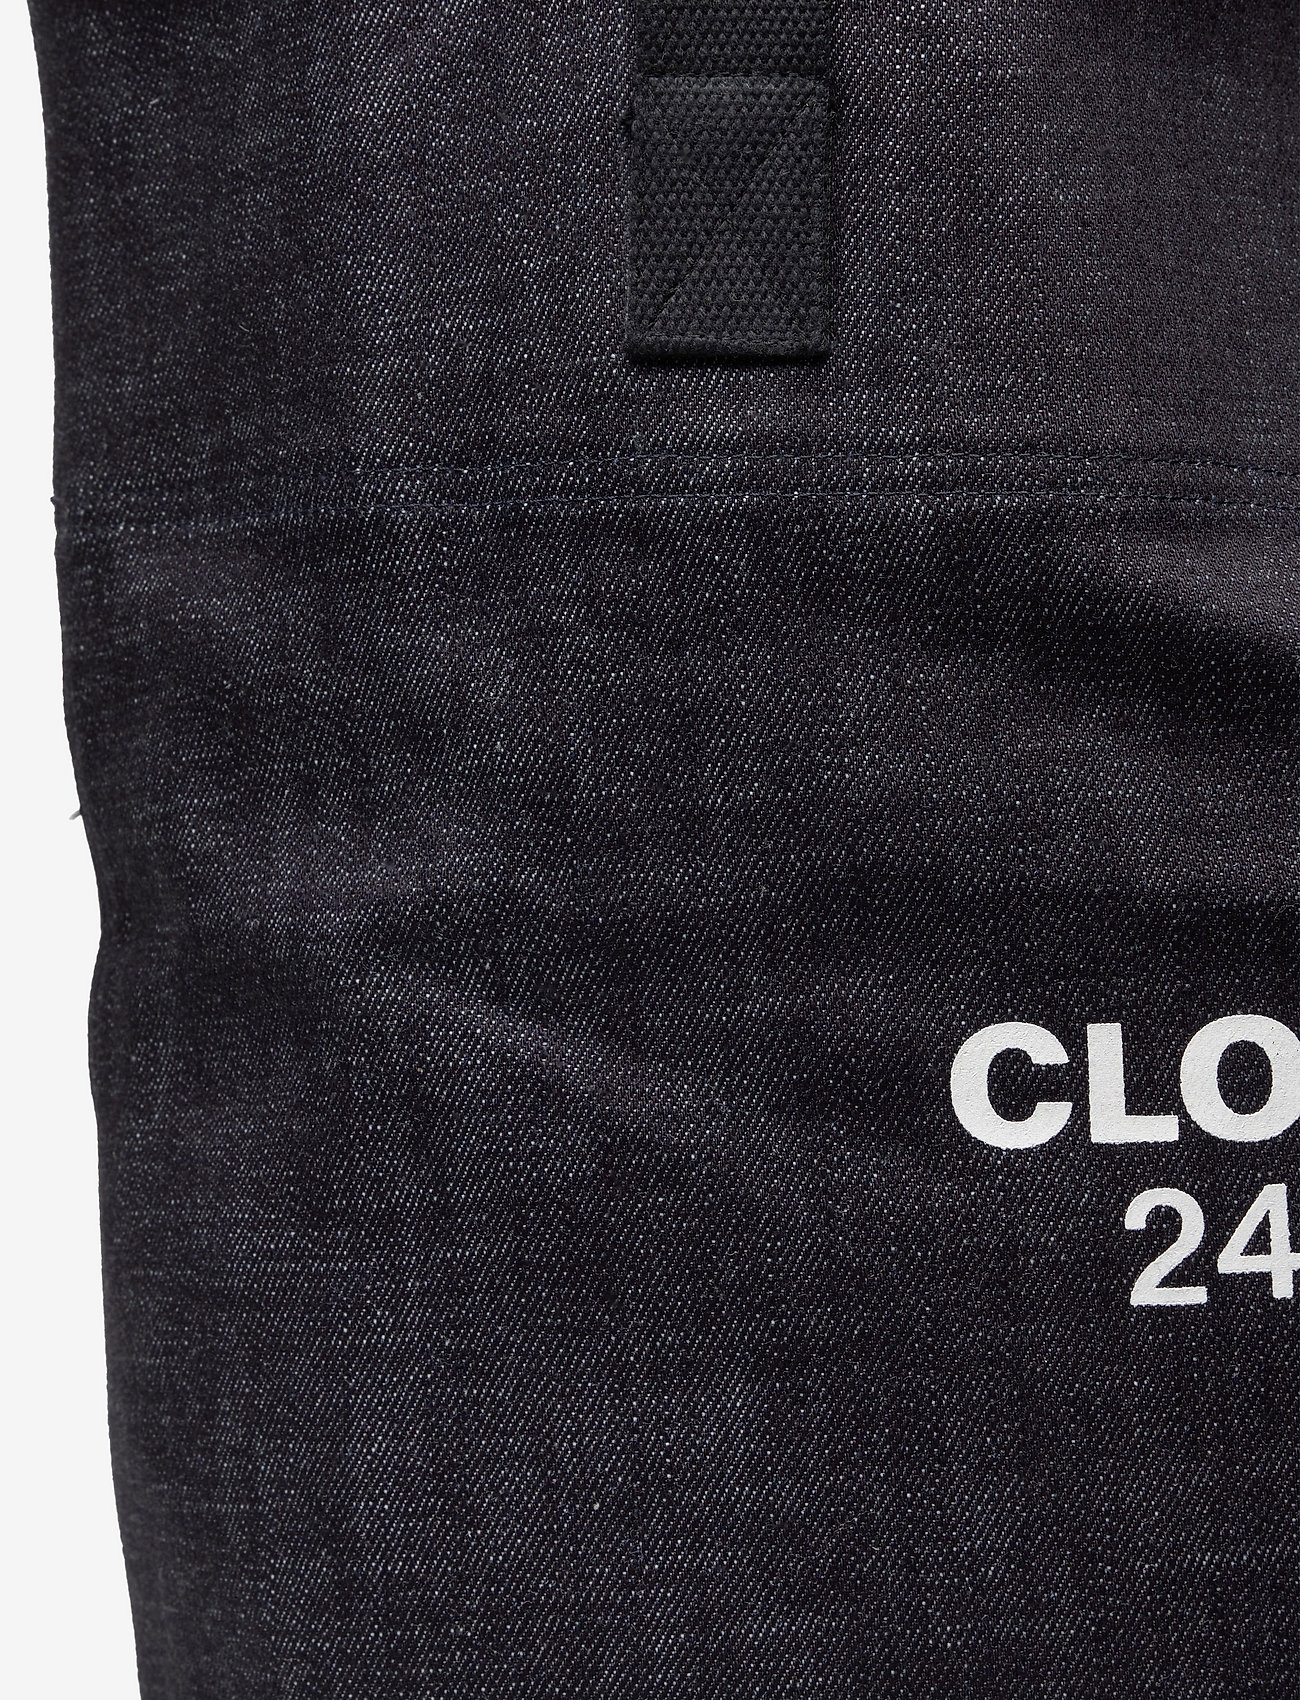 Closed - mens accessories - shoppers - dark blue - 3